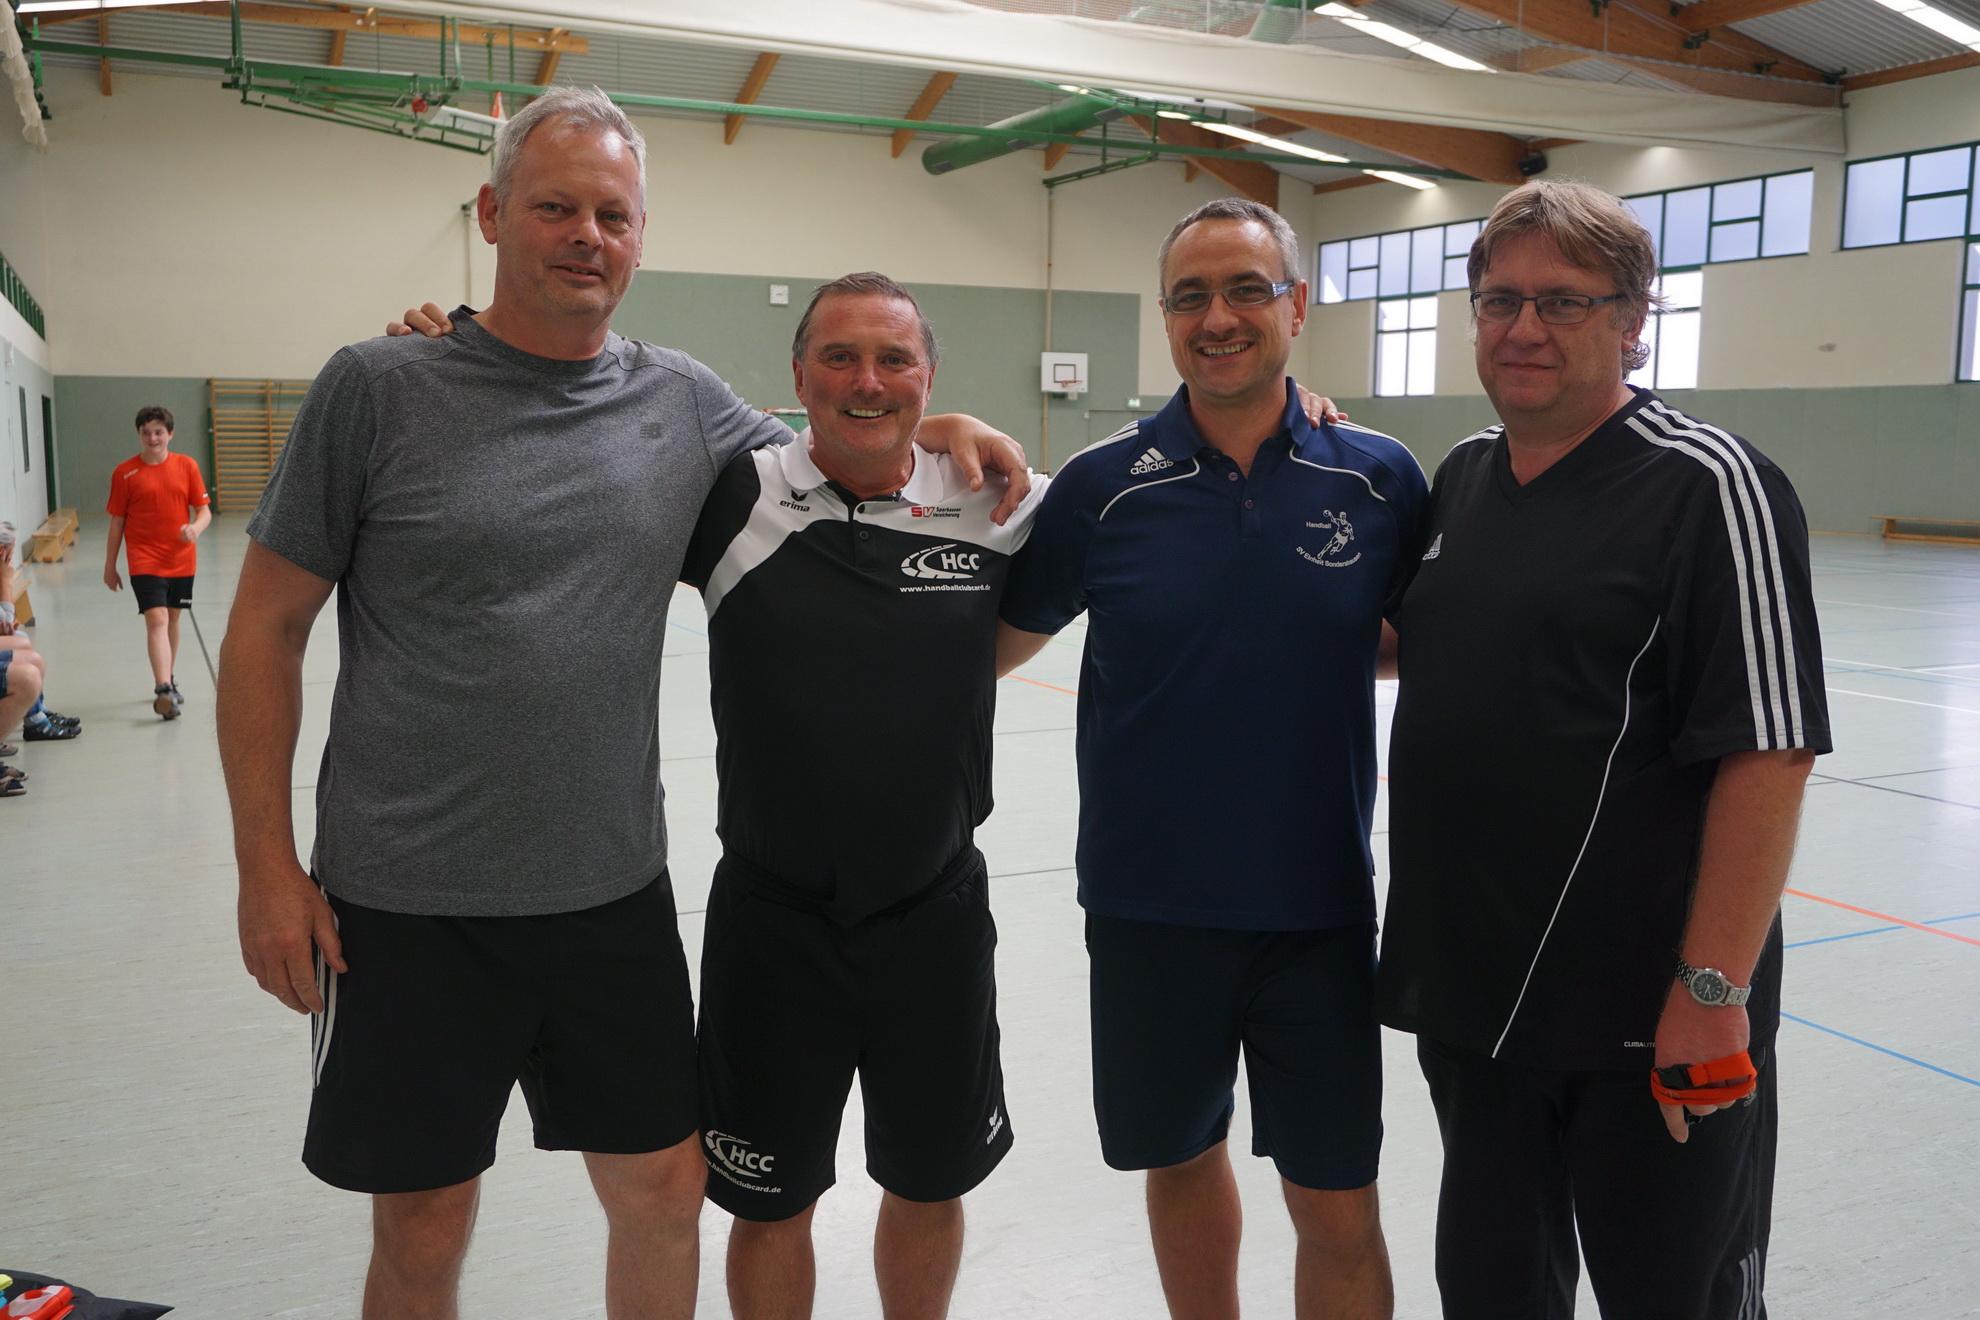 201808_Handballcamp_SDH_MG_302w